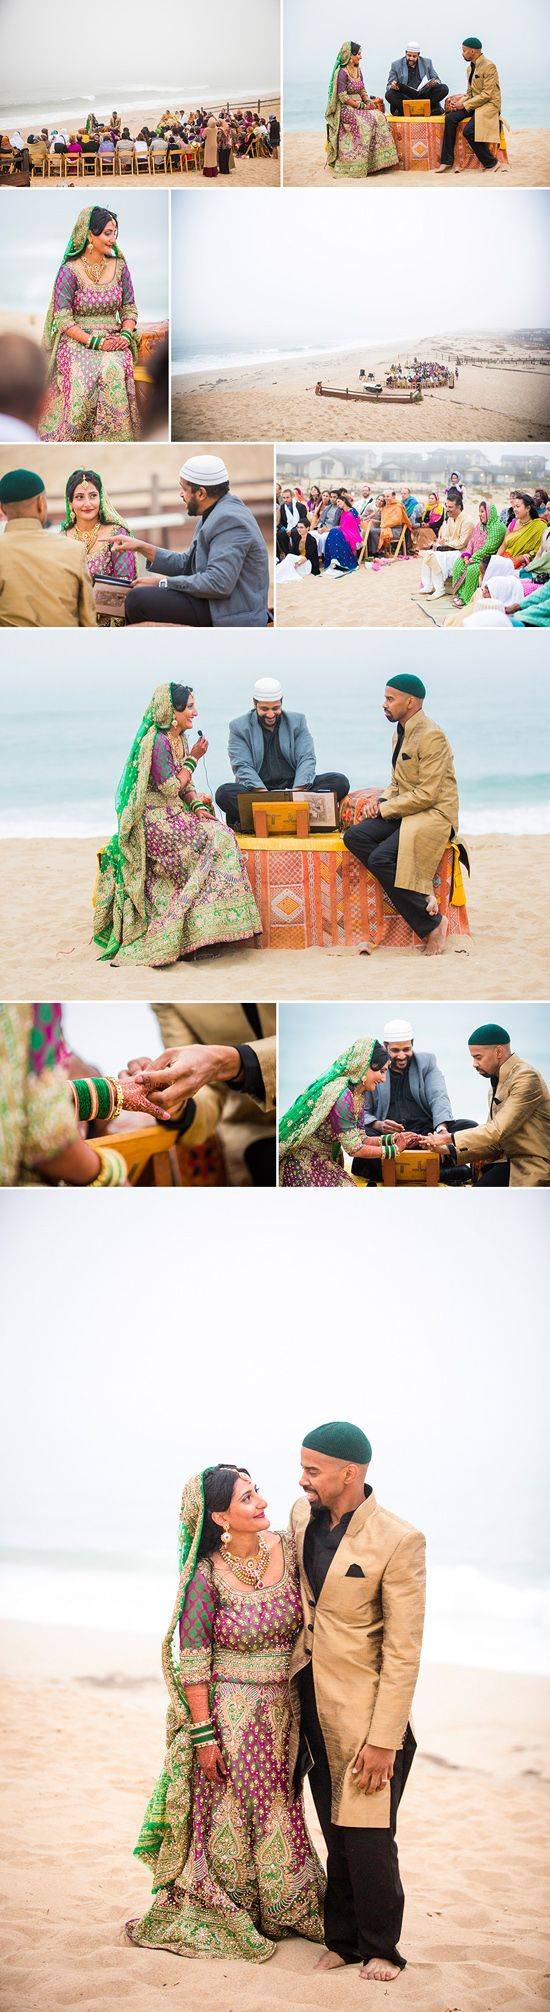 muslim wedding ceremony on the beach